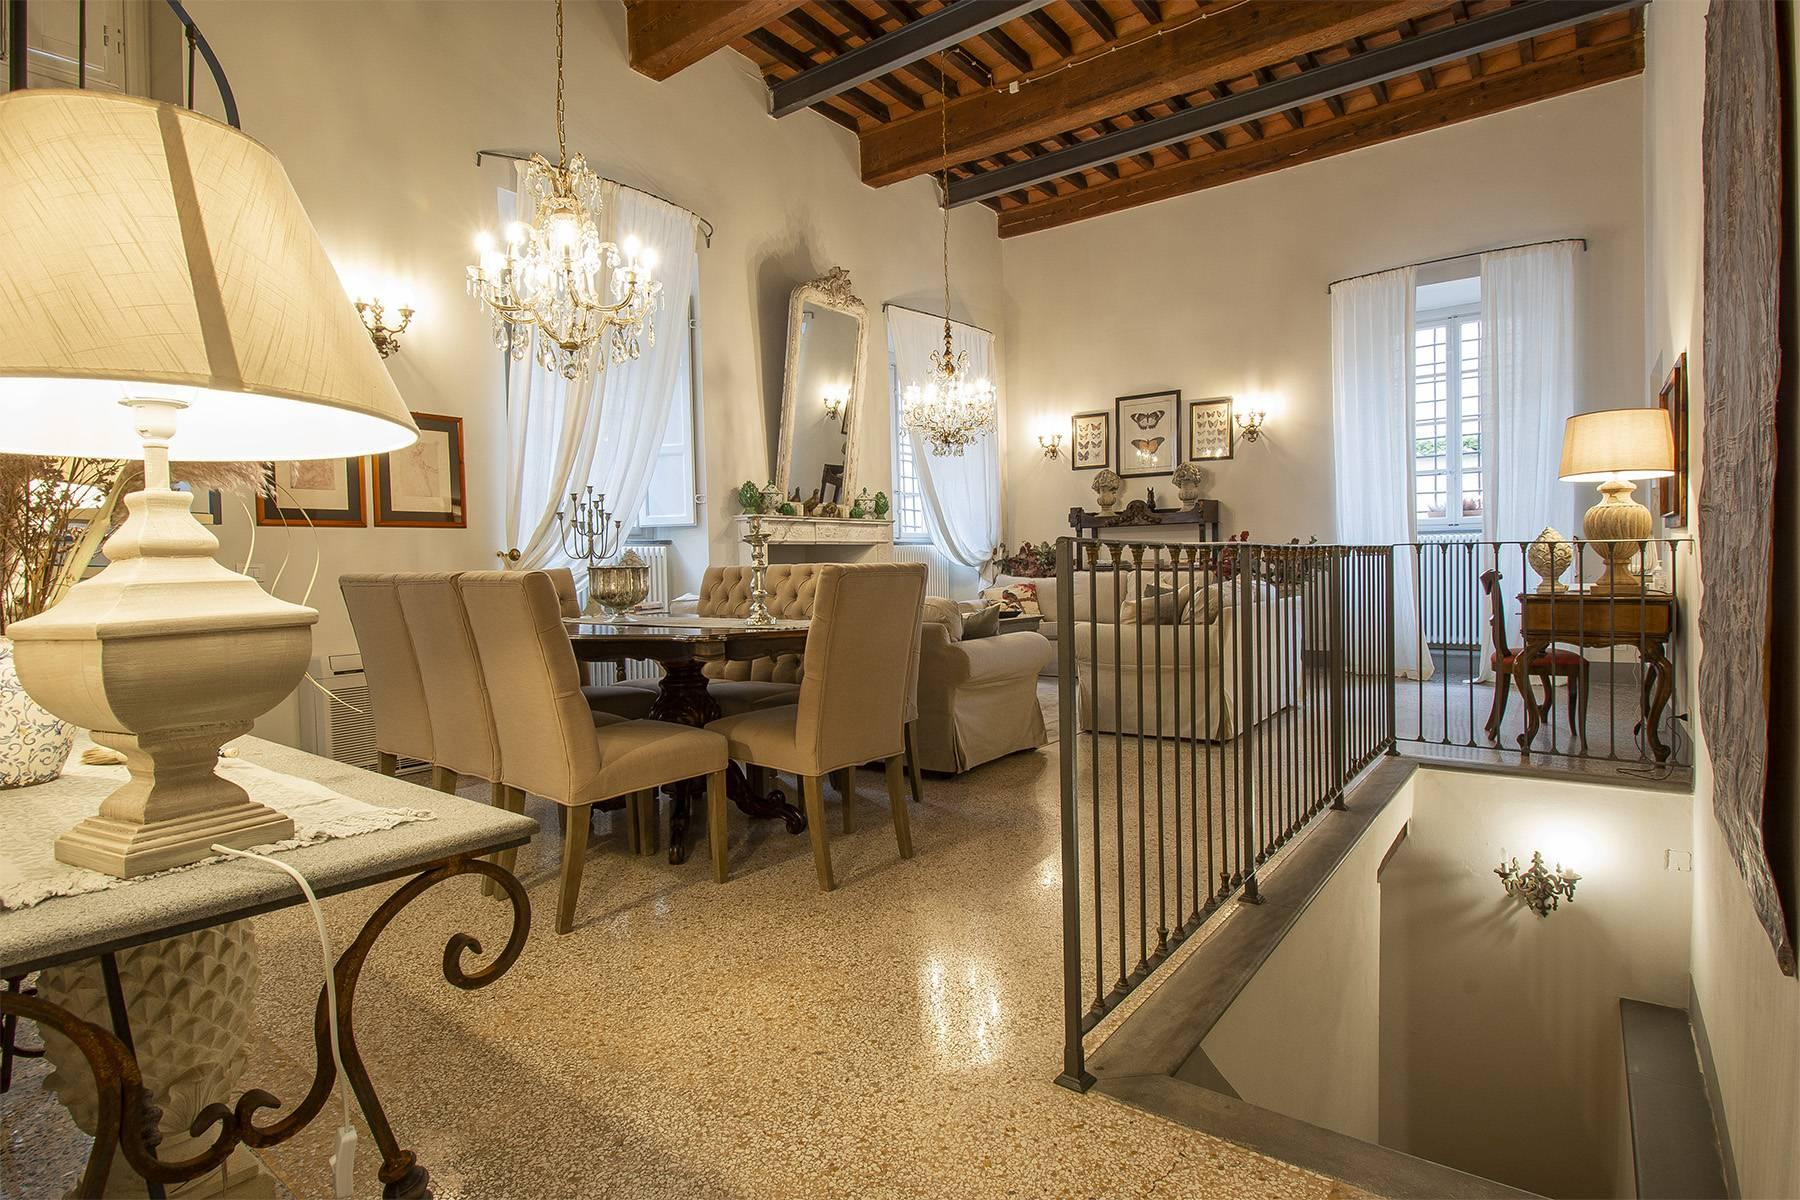 Appartement exclusif au coeur de Lucca - 16